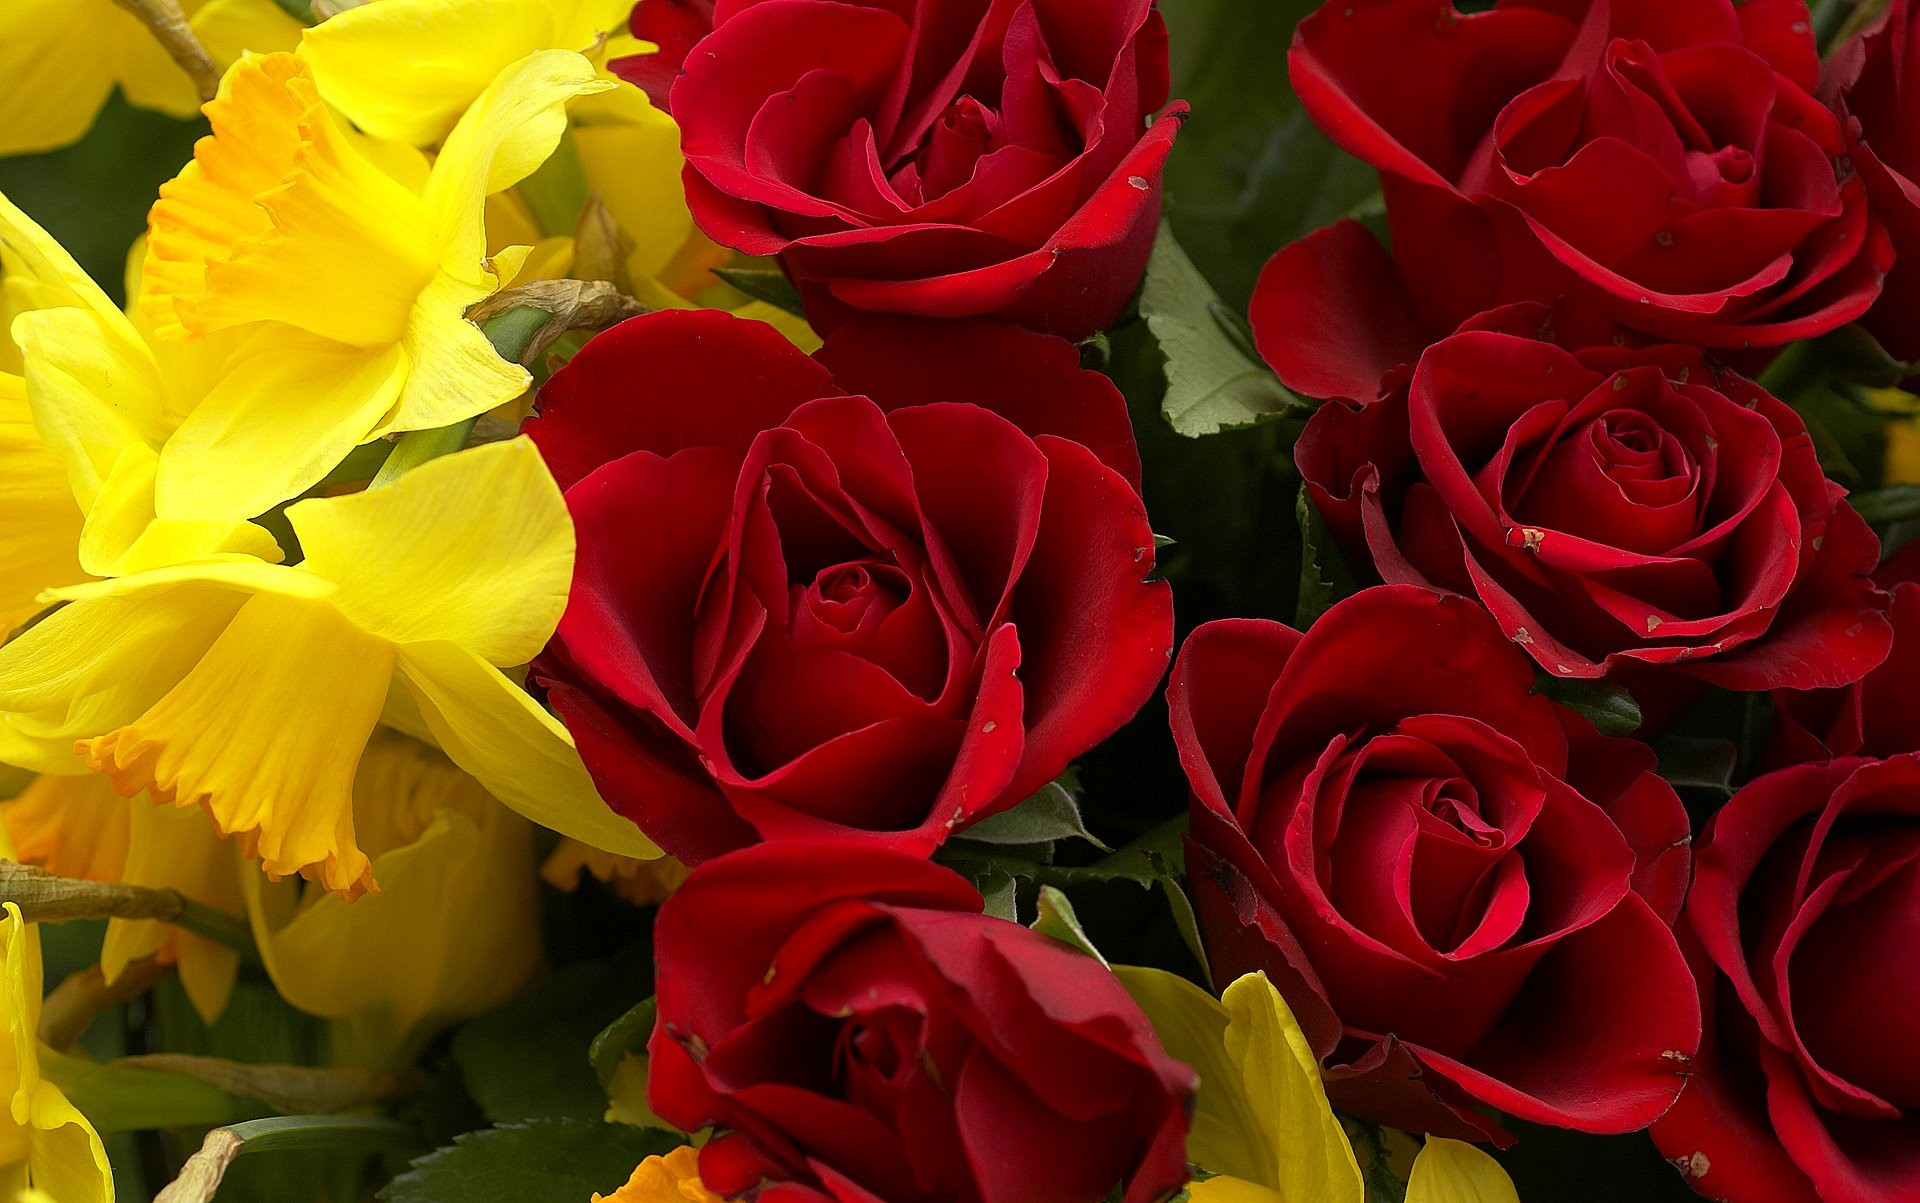 Sfondi Rose 65 Immagini